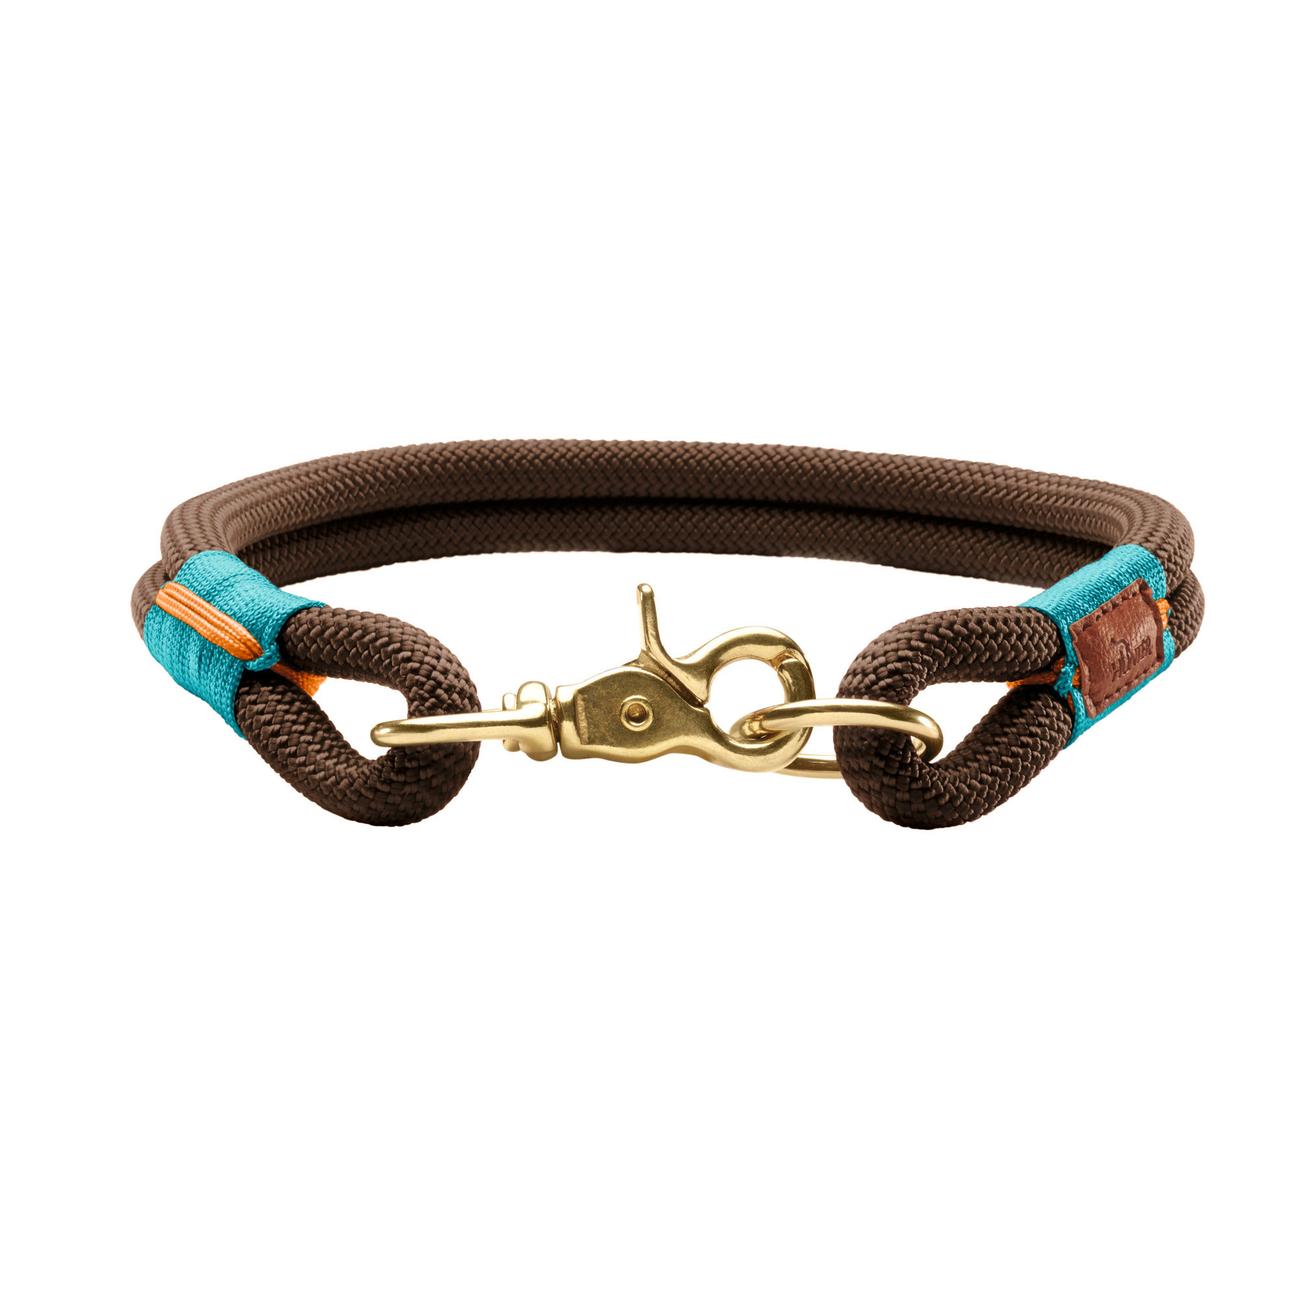 Hunter Halsung Halsband Oss für Hunde 66989, Bild 2